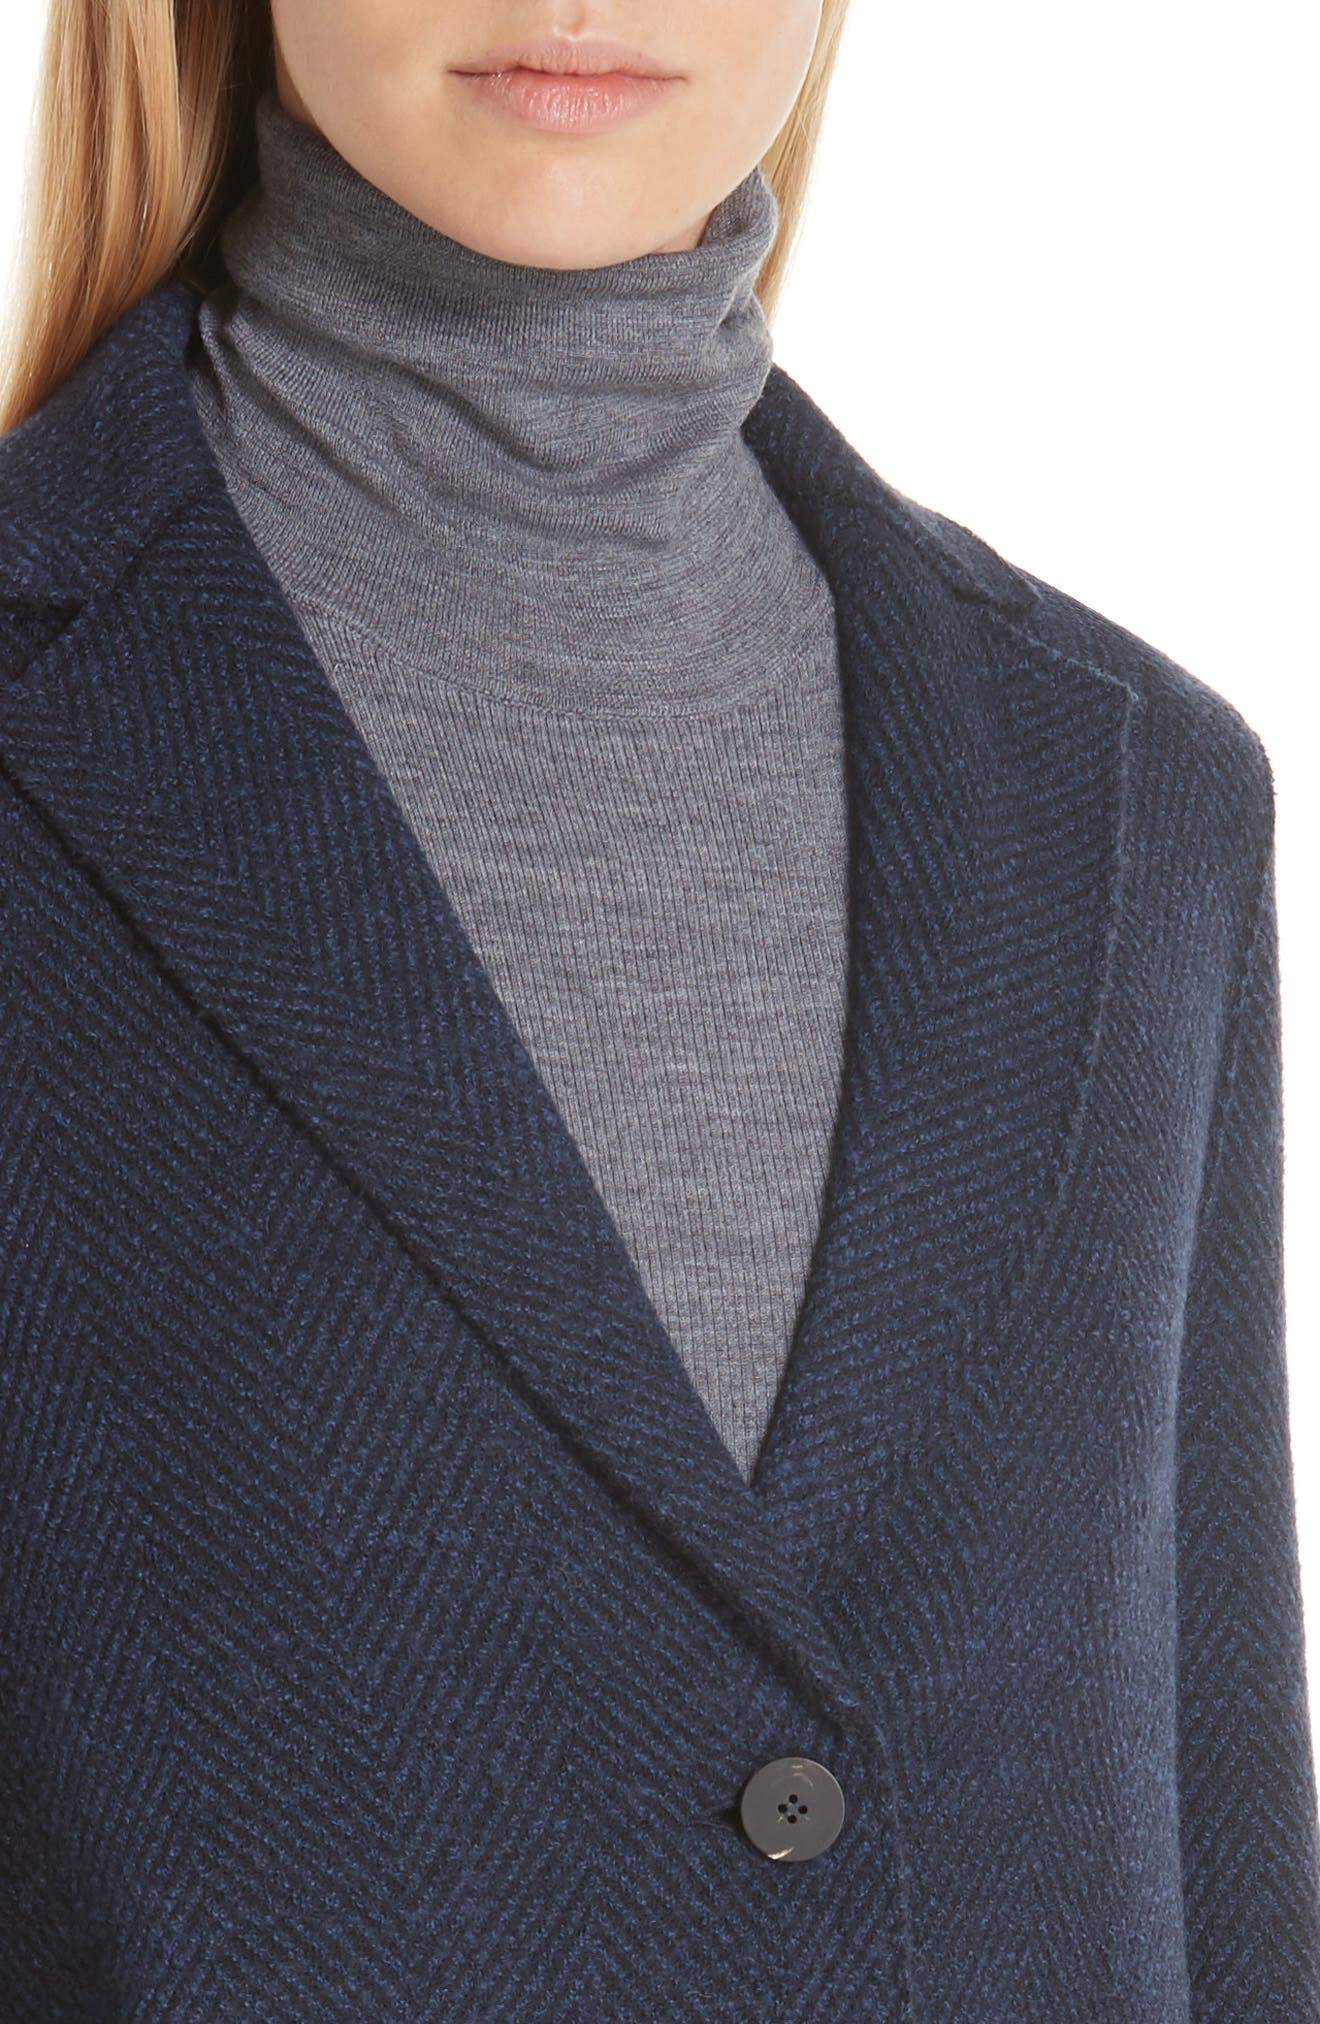 Herringbone Wool Coat,                             Alternate thumbnail 4, color,                             NAVY BLUE